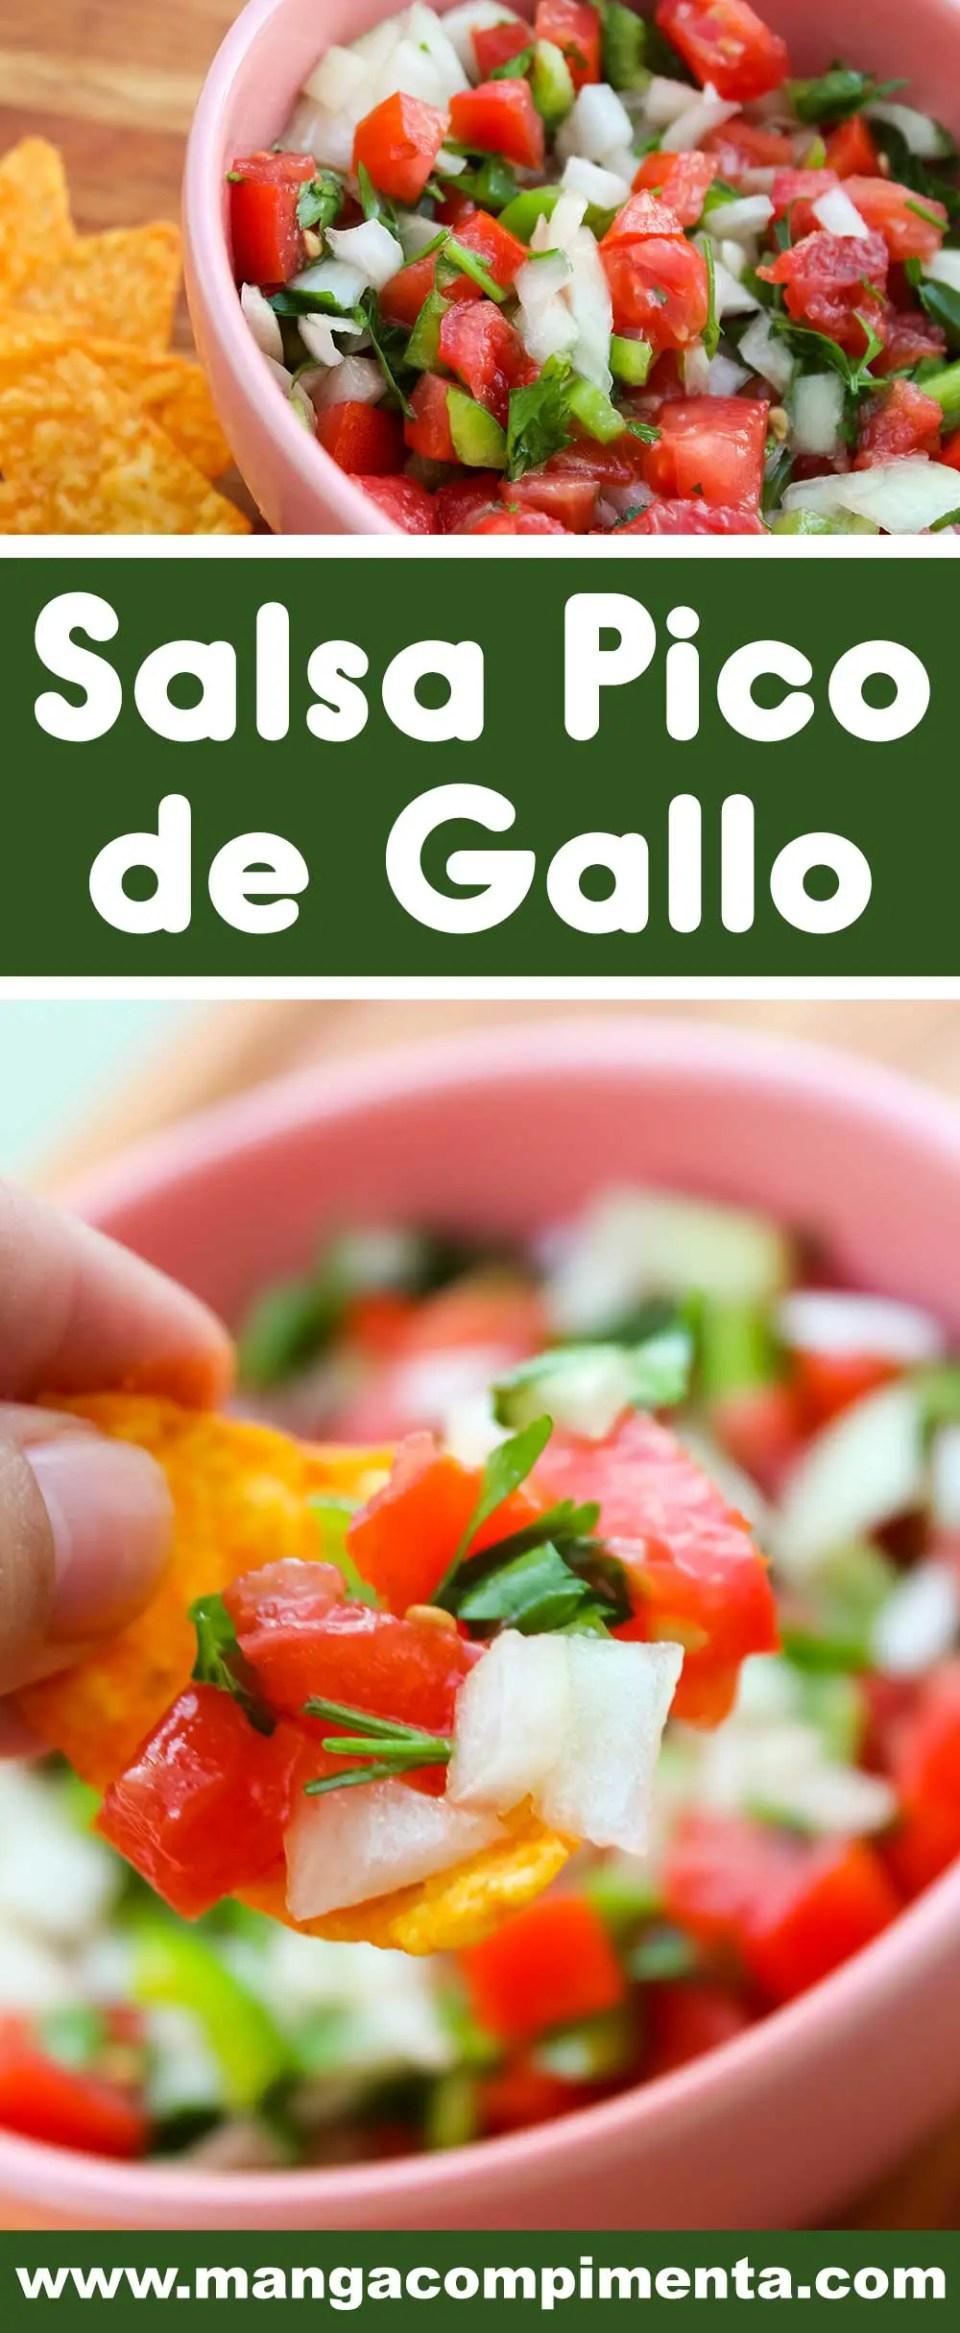 Receita de Salsa Pico de Gallo - um prato mexicano para lanchar e petiscar com os amigos.